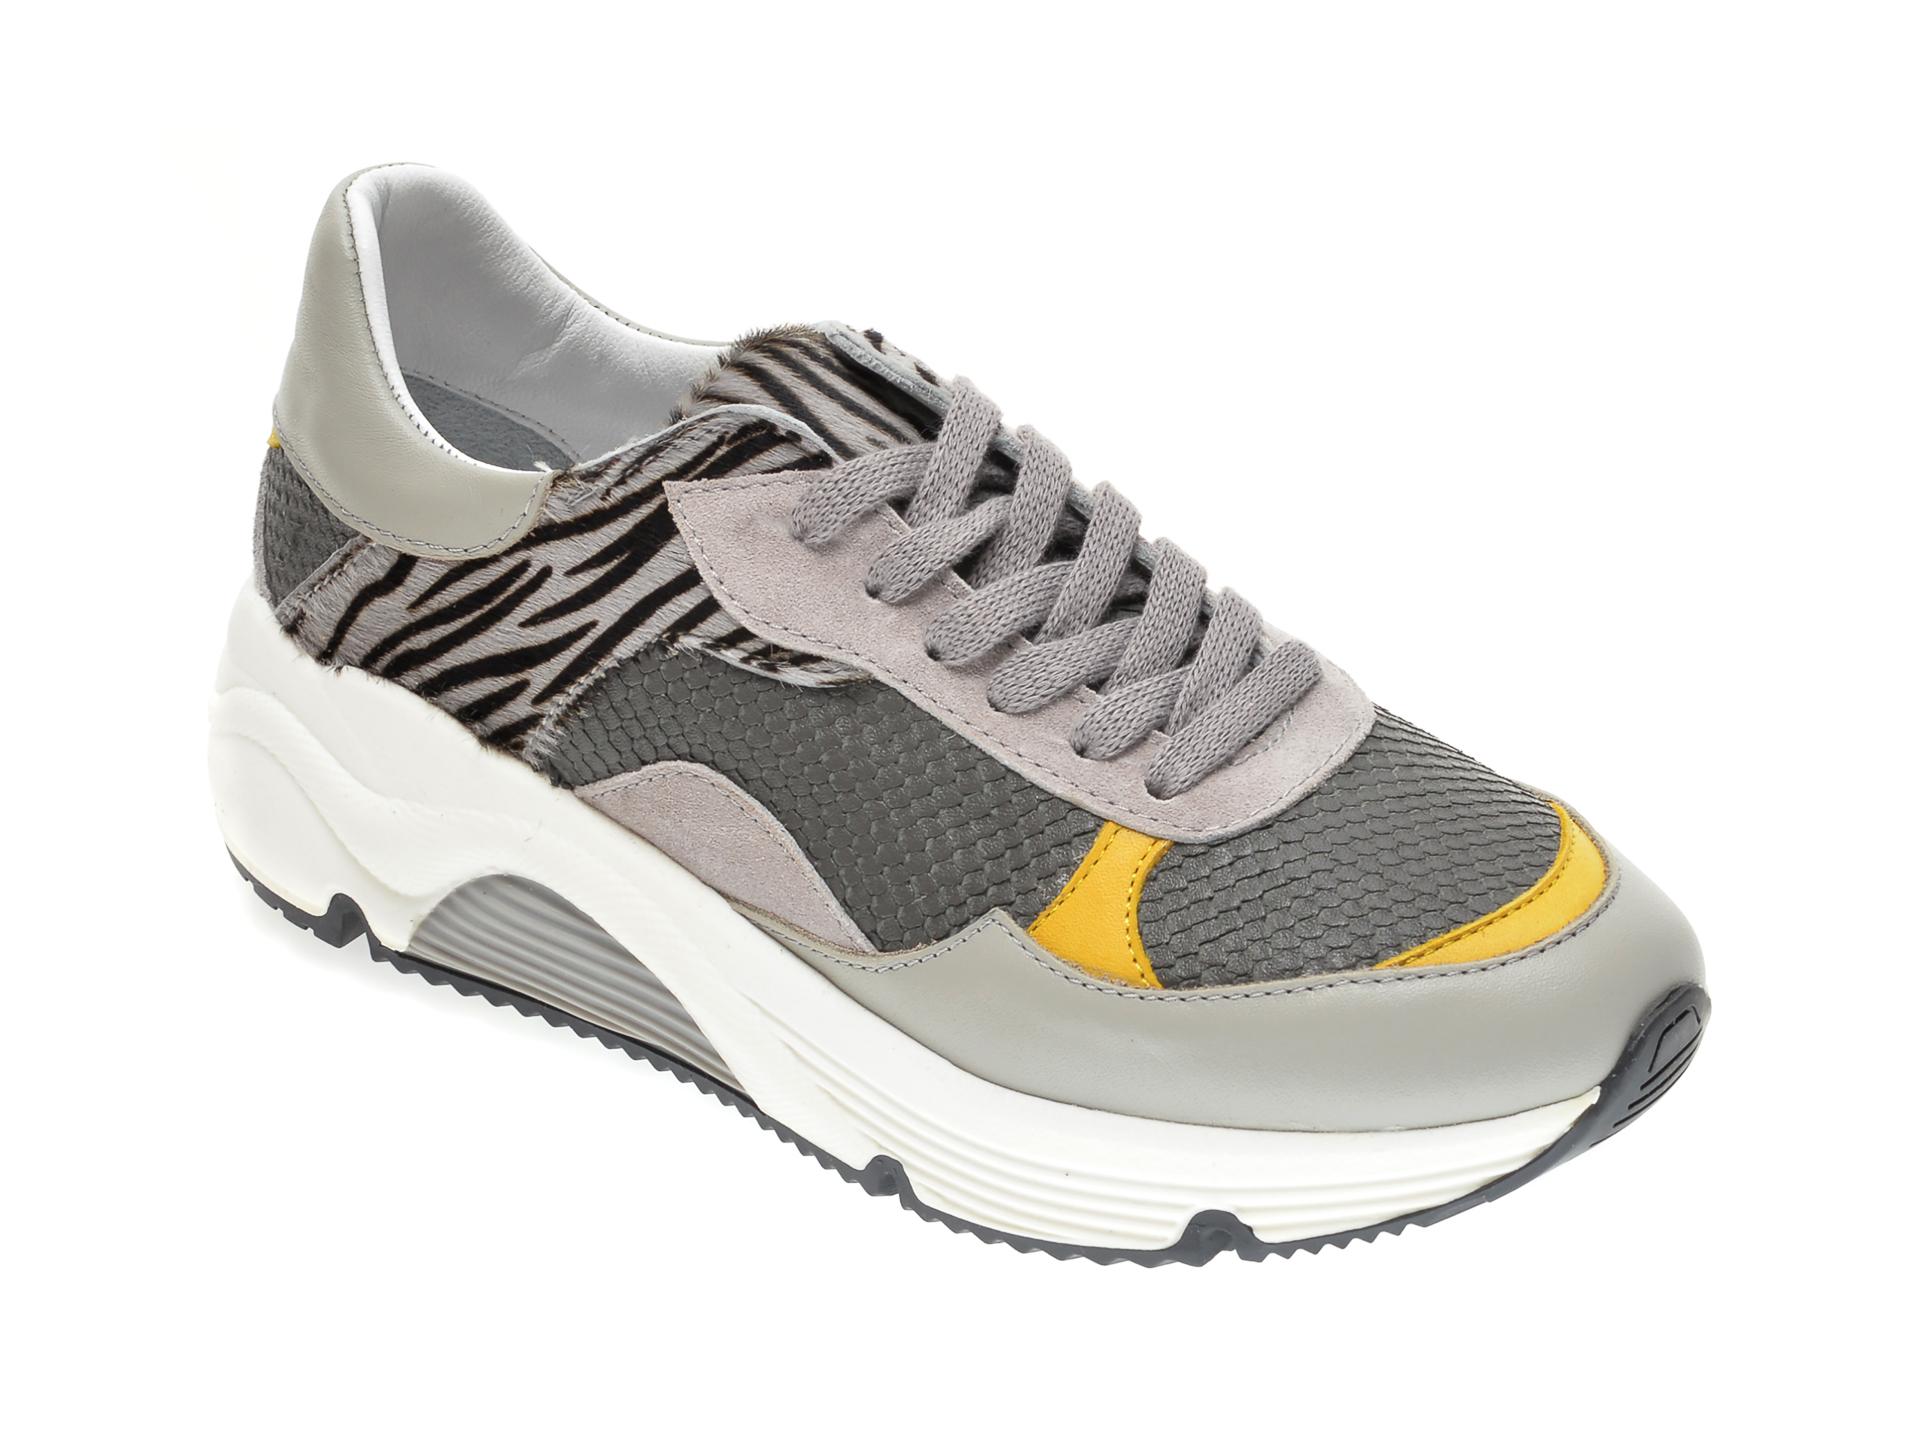 Pantofi sport RADIKAL gri, 2730, din piele naturala New